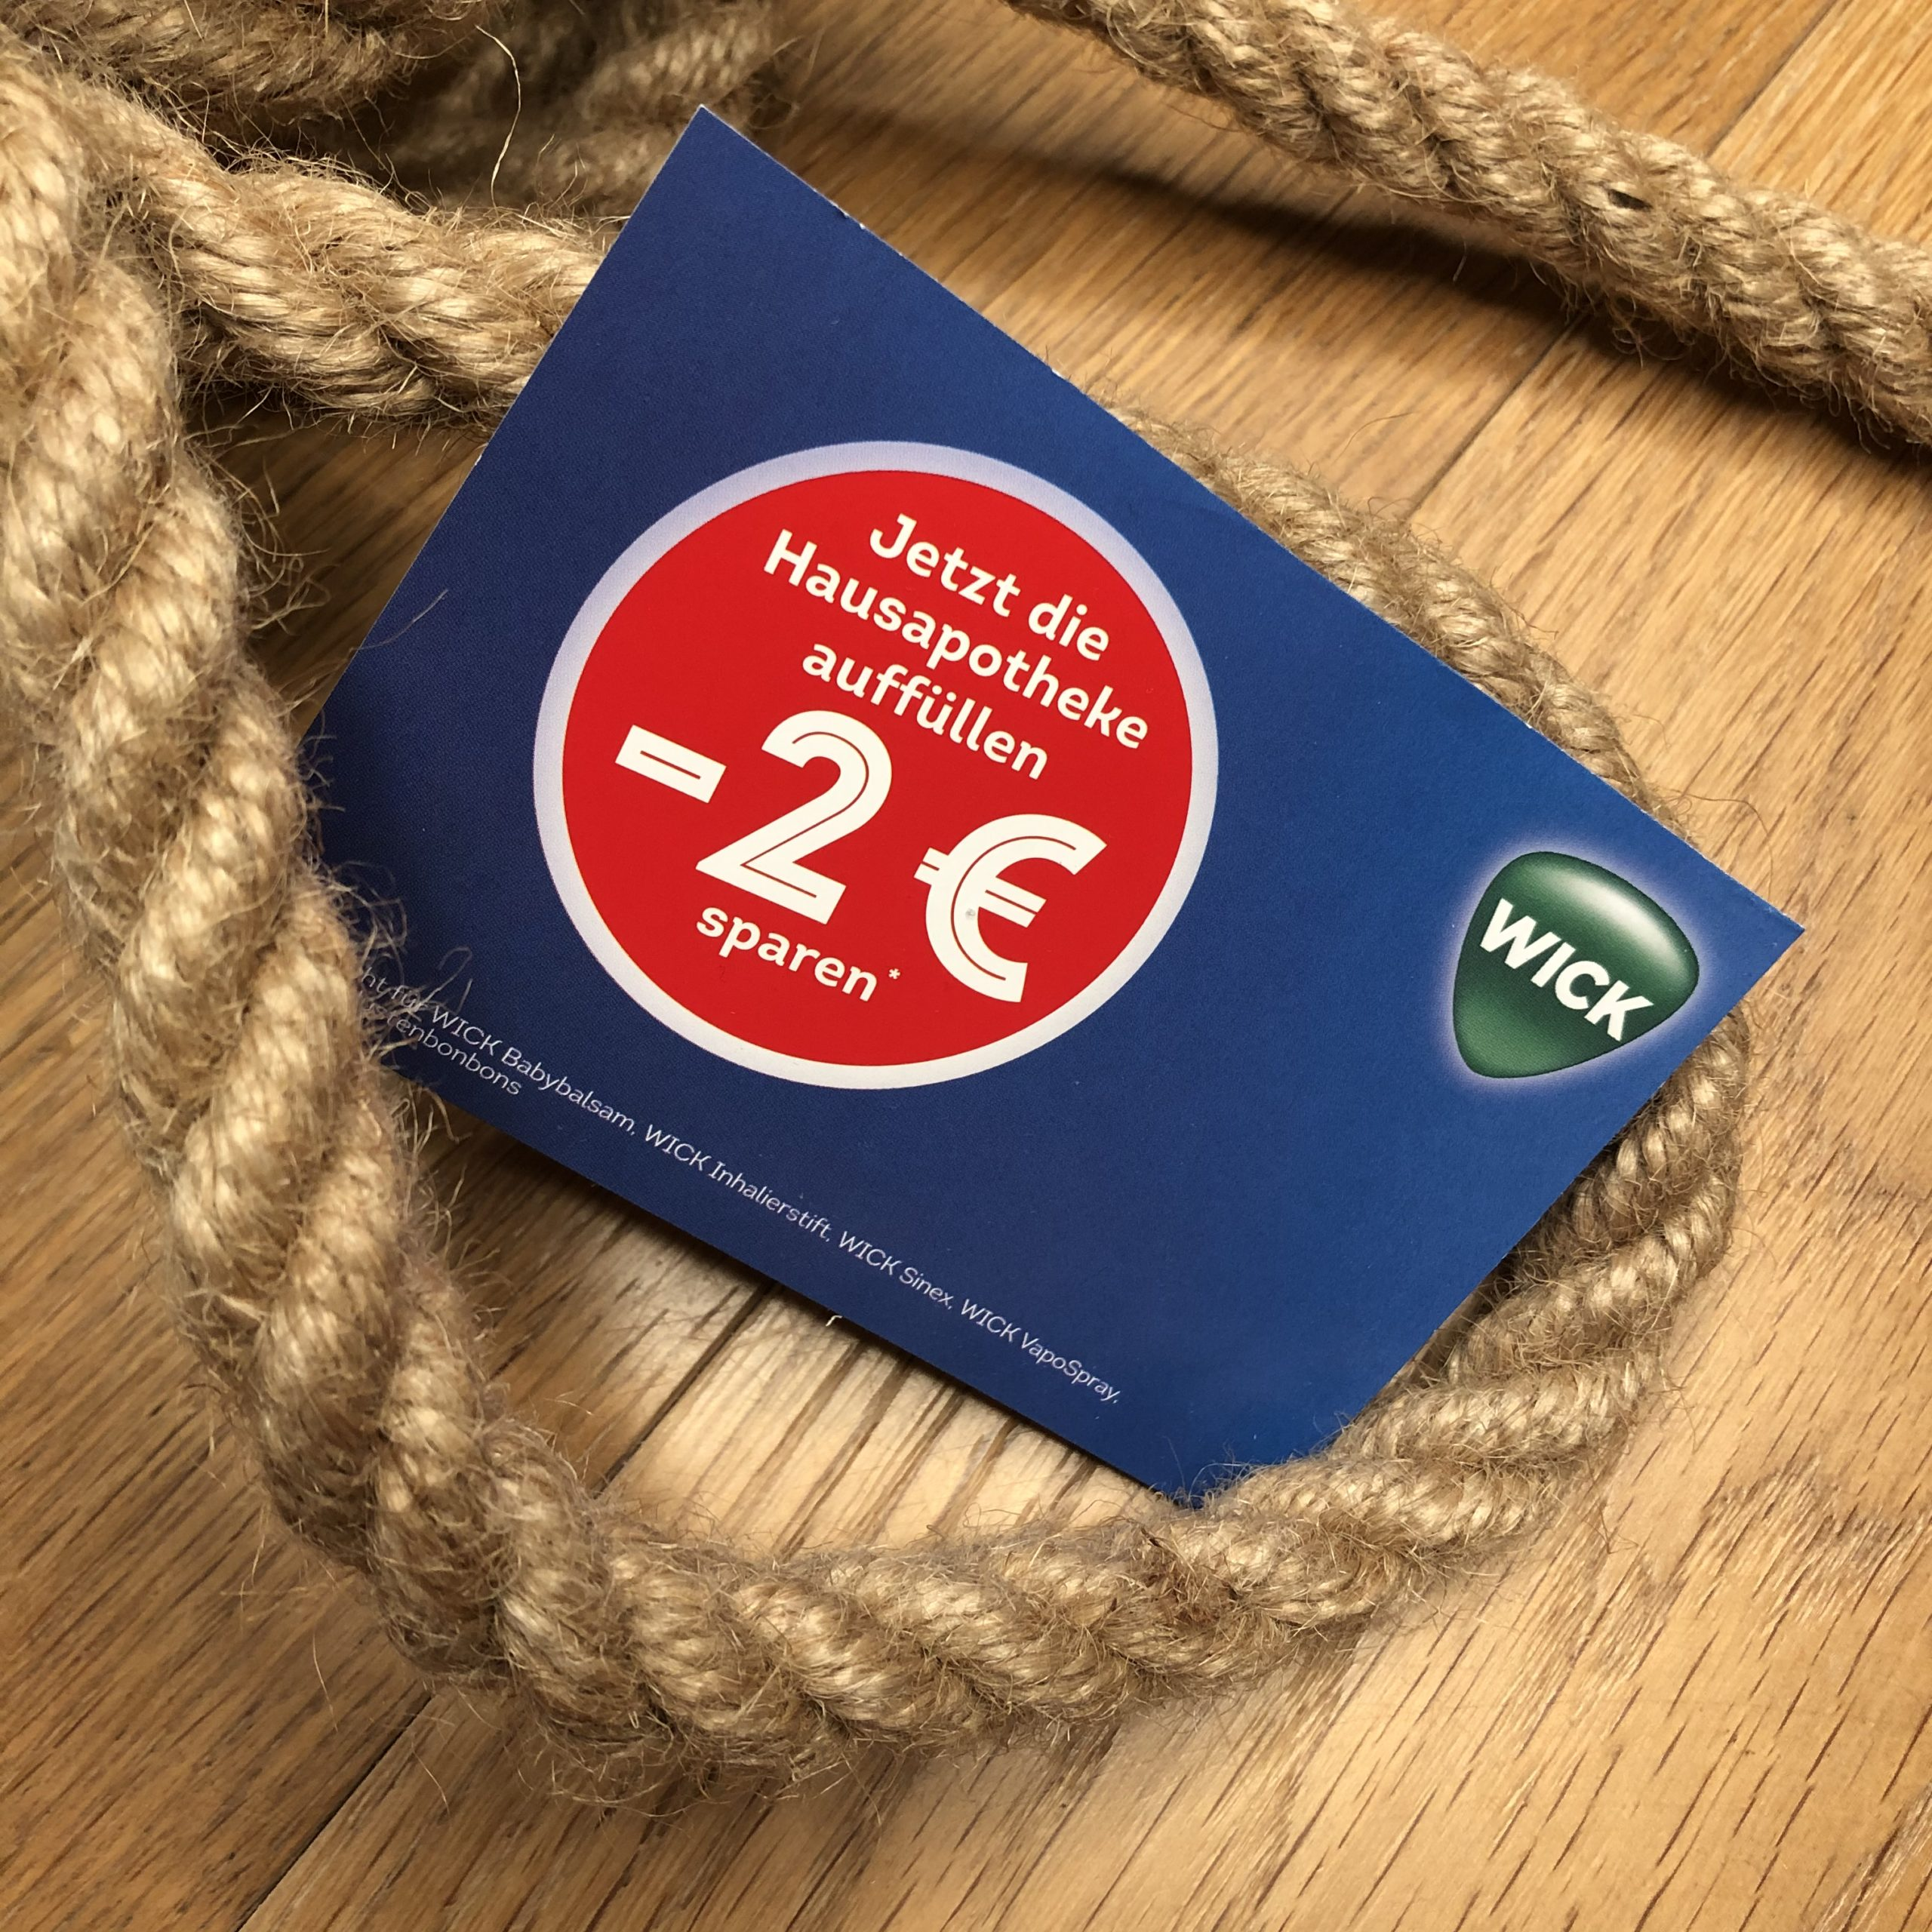 Wick Angebot - Königs-Apotheke Mün